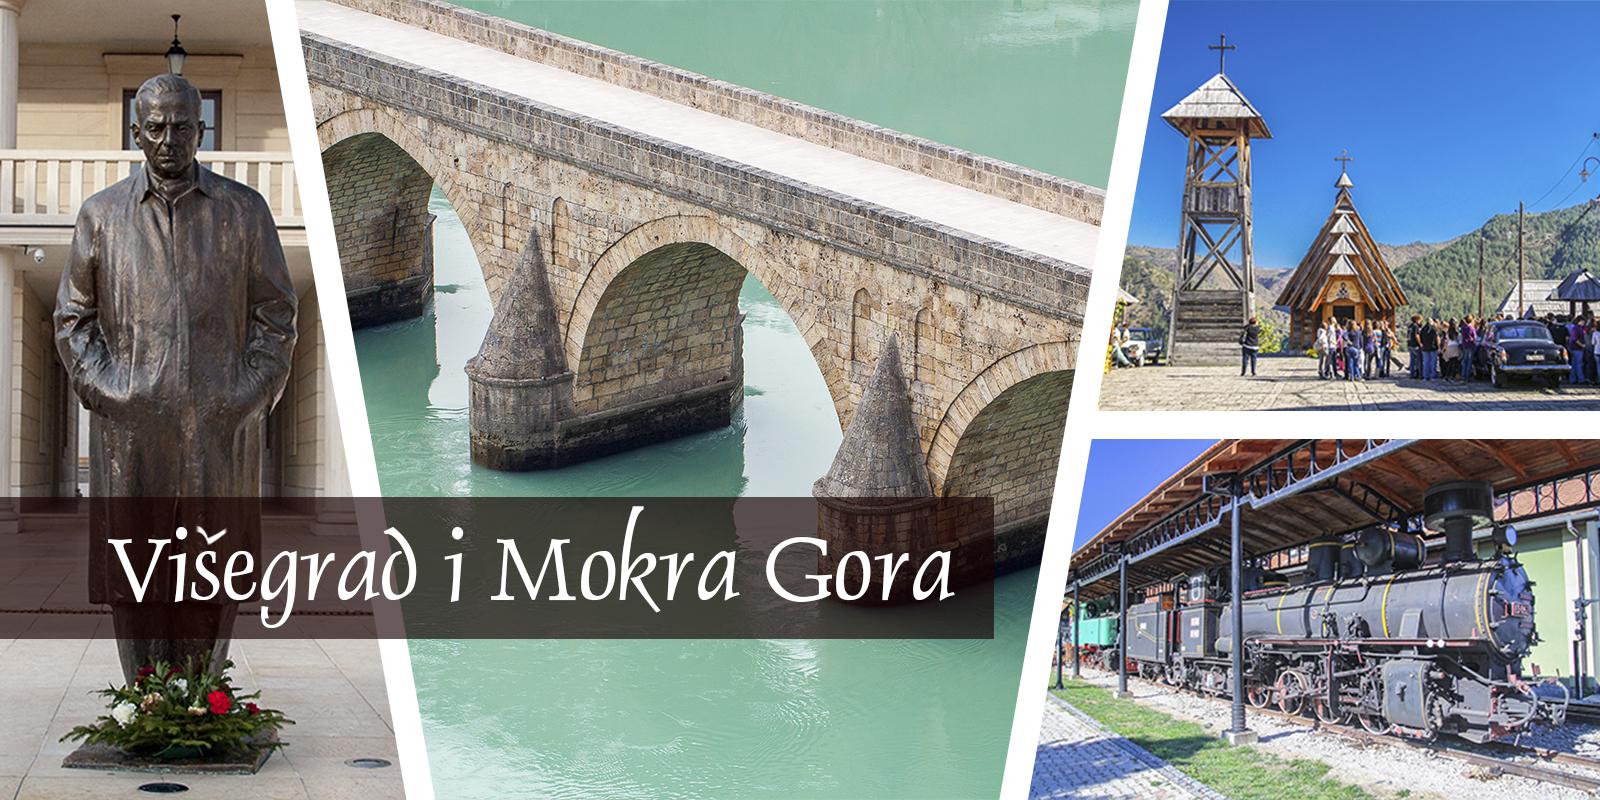 Visegrad Wyszehrad Bośnia Andrić Most na Drinie Mecavnik Kusturica Mokra Gora